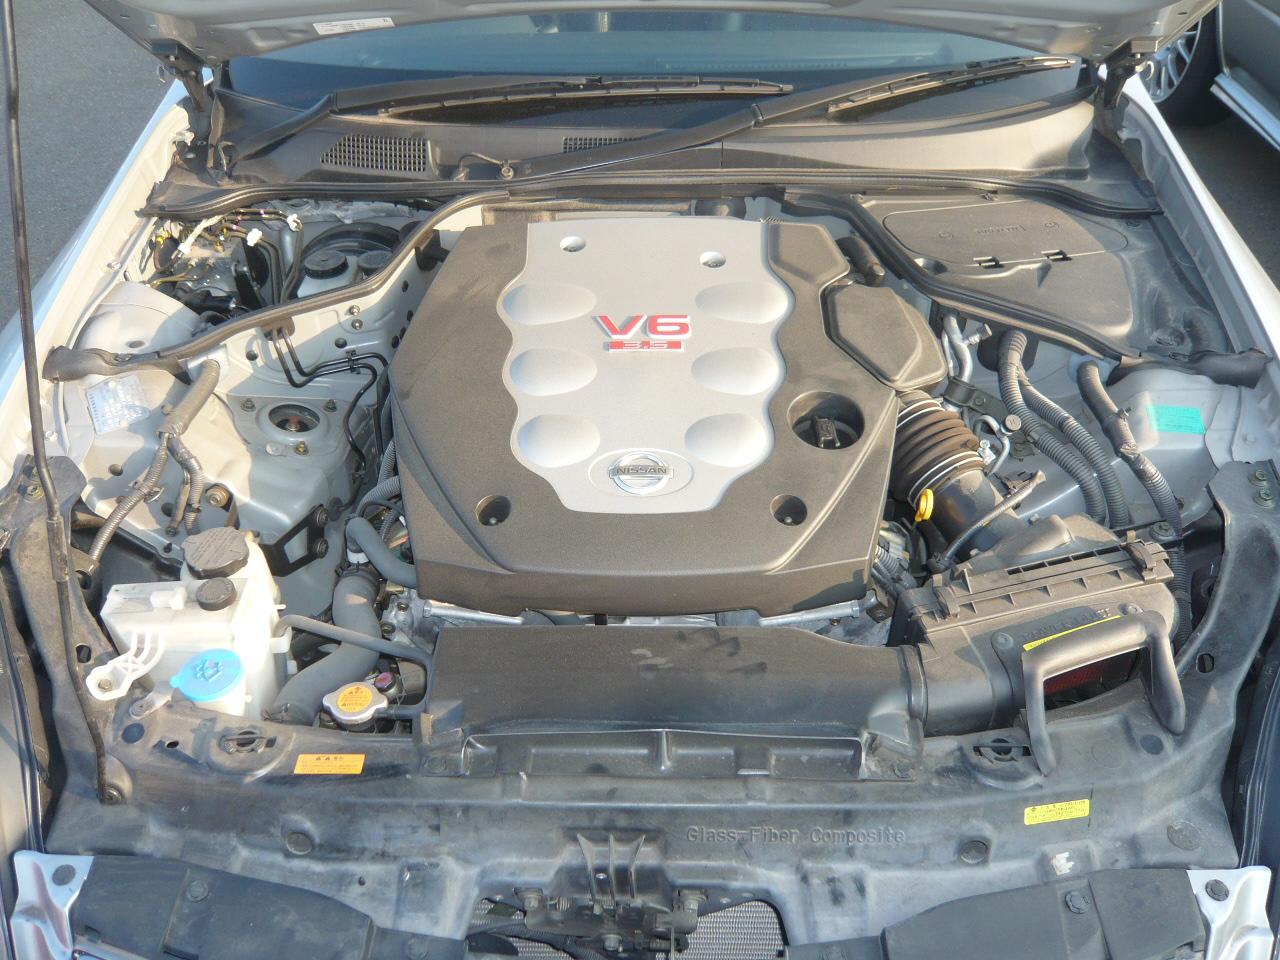 2004 Nissan Skyline V35 350GT Premium coupe 6 speed manual engine